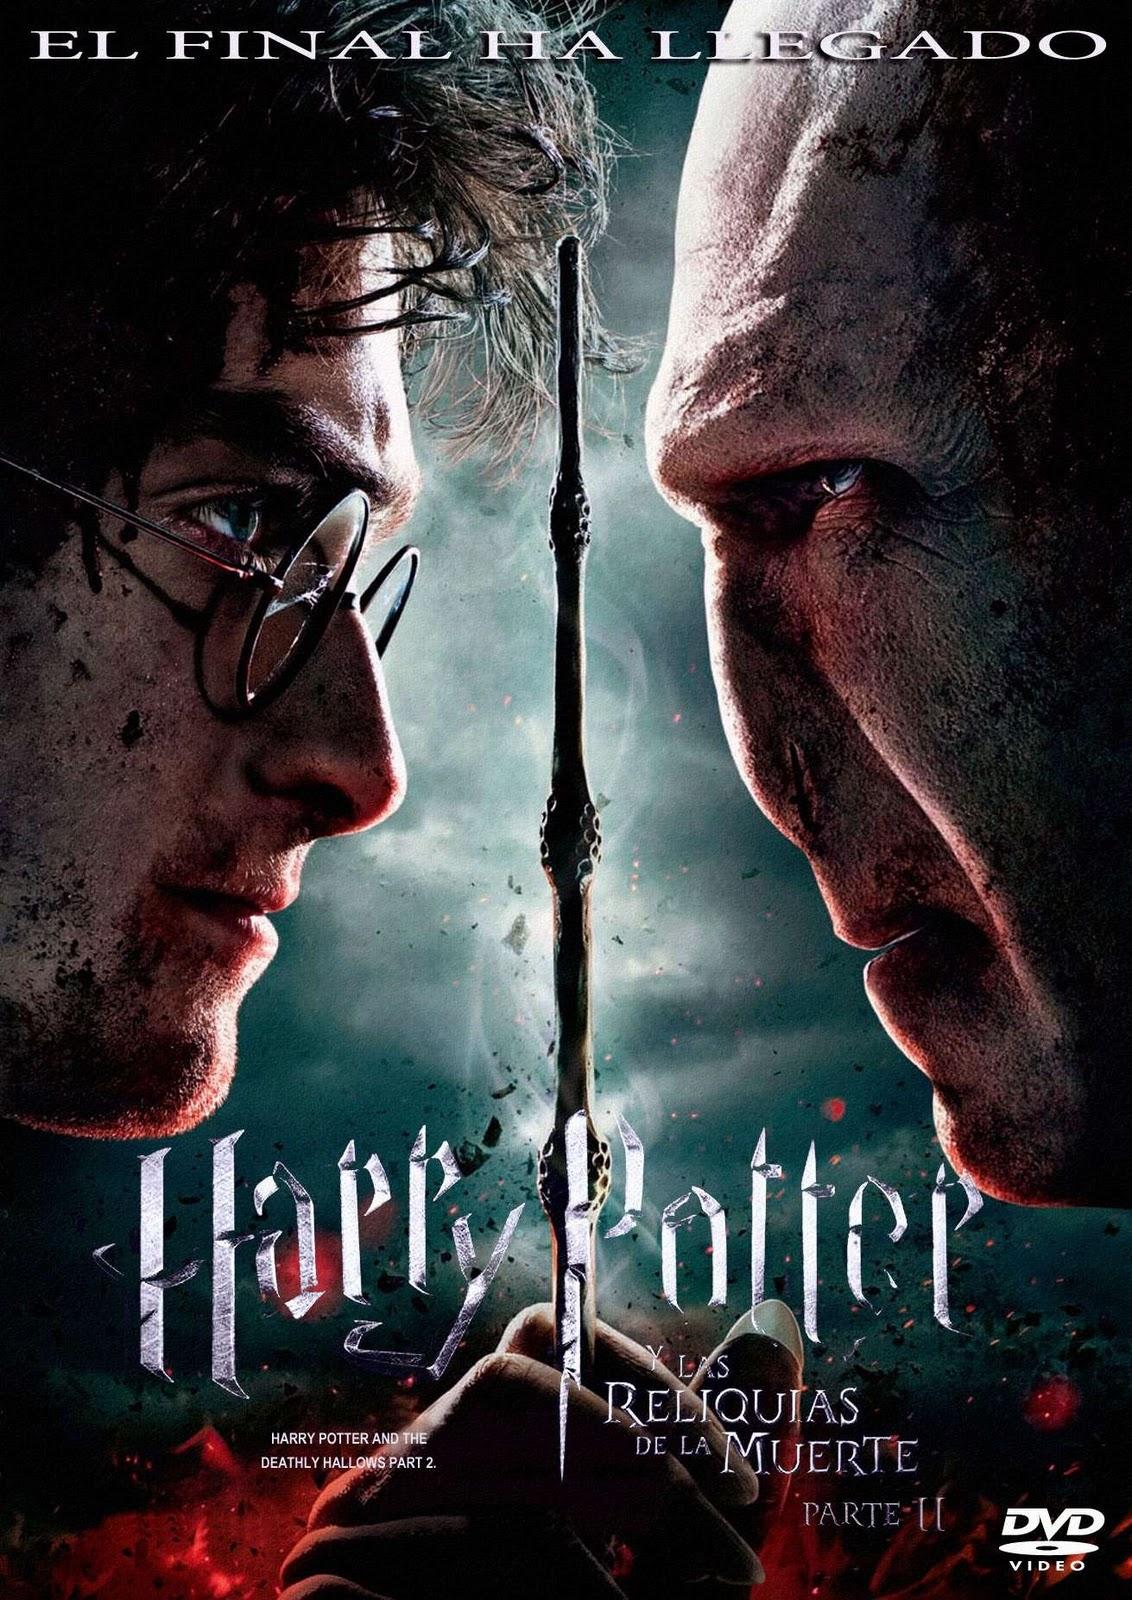 http://2.bp.blogspot.com/-GEx6cJvp_dw/Tp65GjS-52I/AAAAAAAAFm8/F0eXx_BVbMs/s1600/Harry_Potter_Y_Las_Reliquias_De_La_Muerte_-_Parte_2_-_Custom_por_kal-noc_%5Bdvd%5D_80.jpg